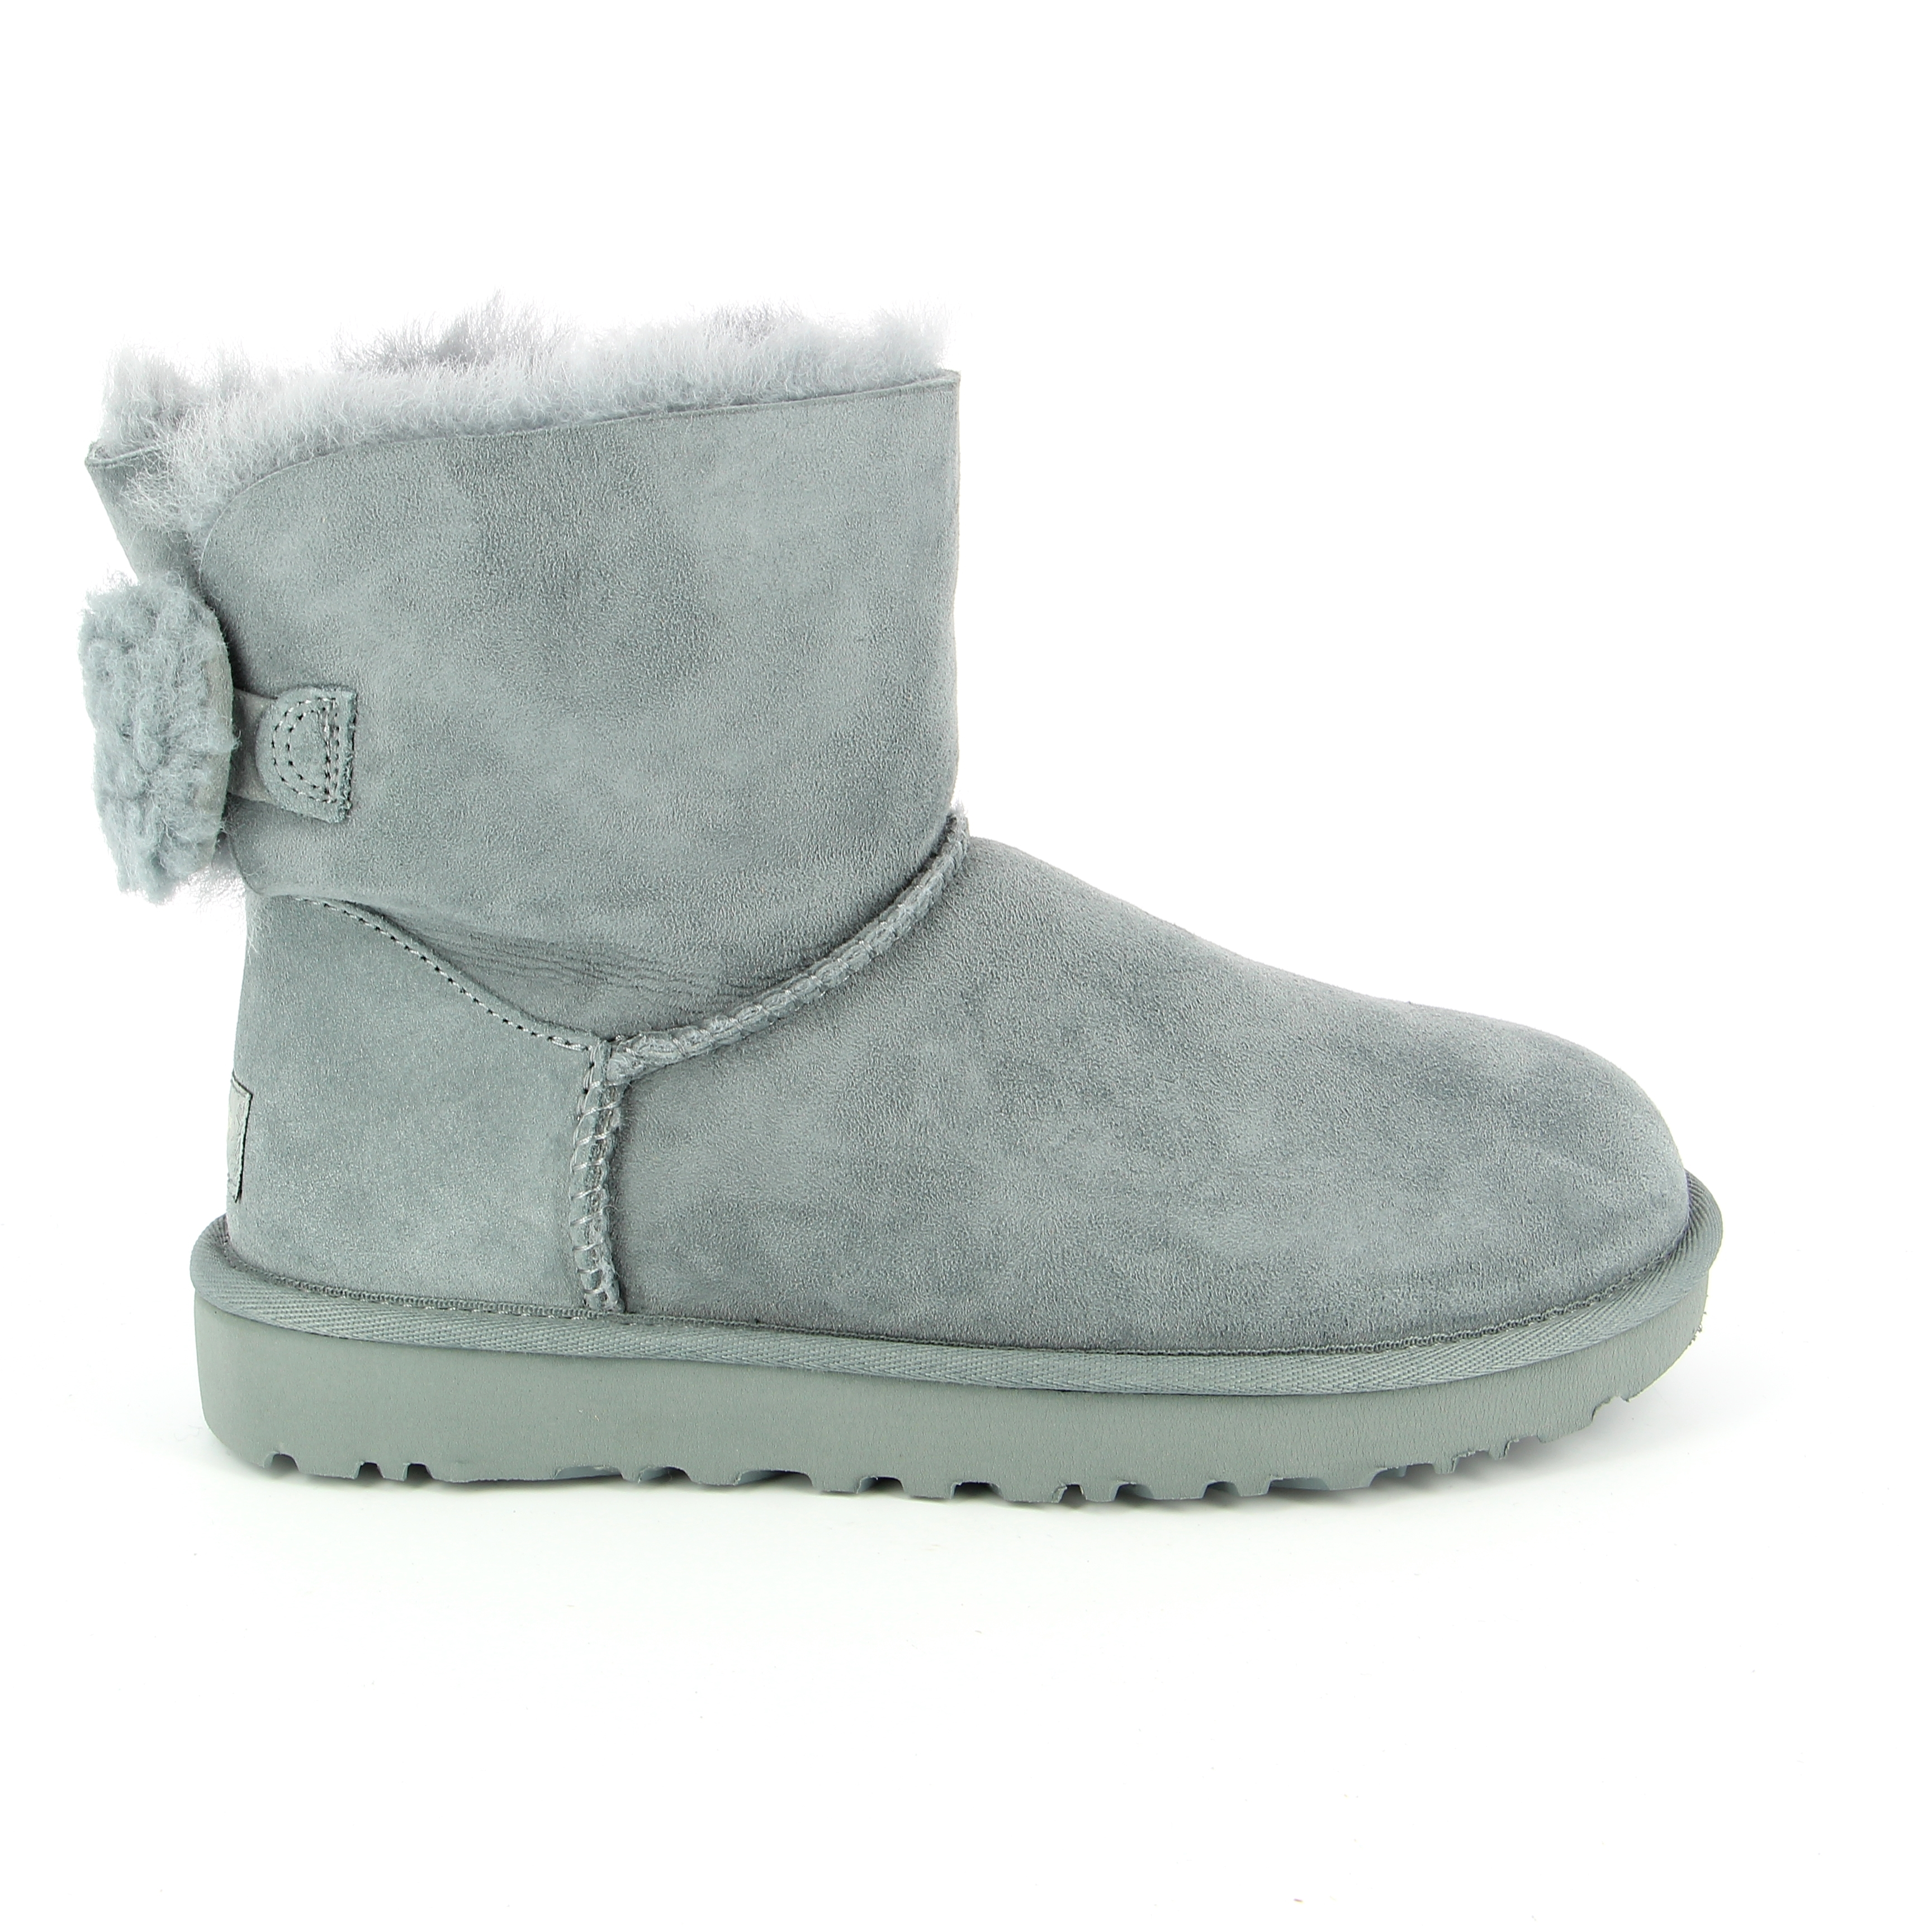 Ugg Boots hemelsblauw